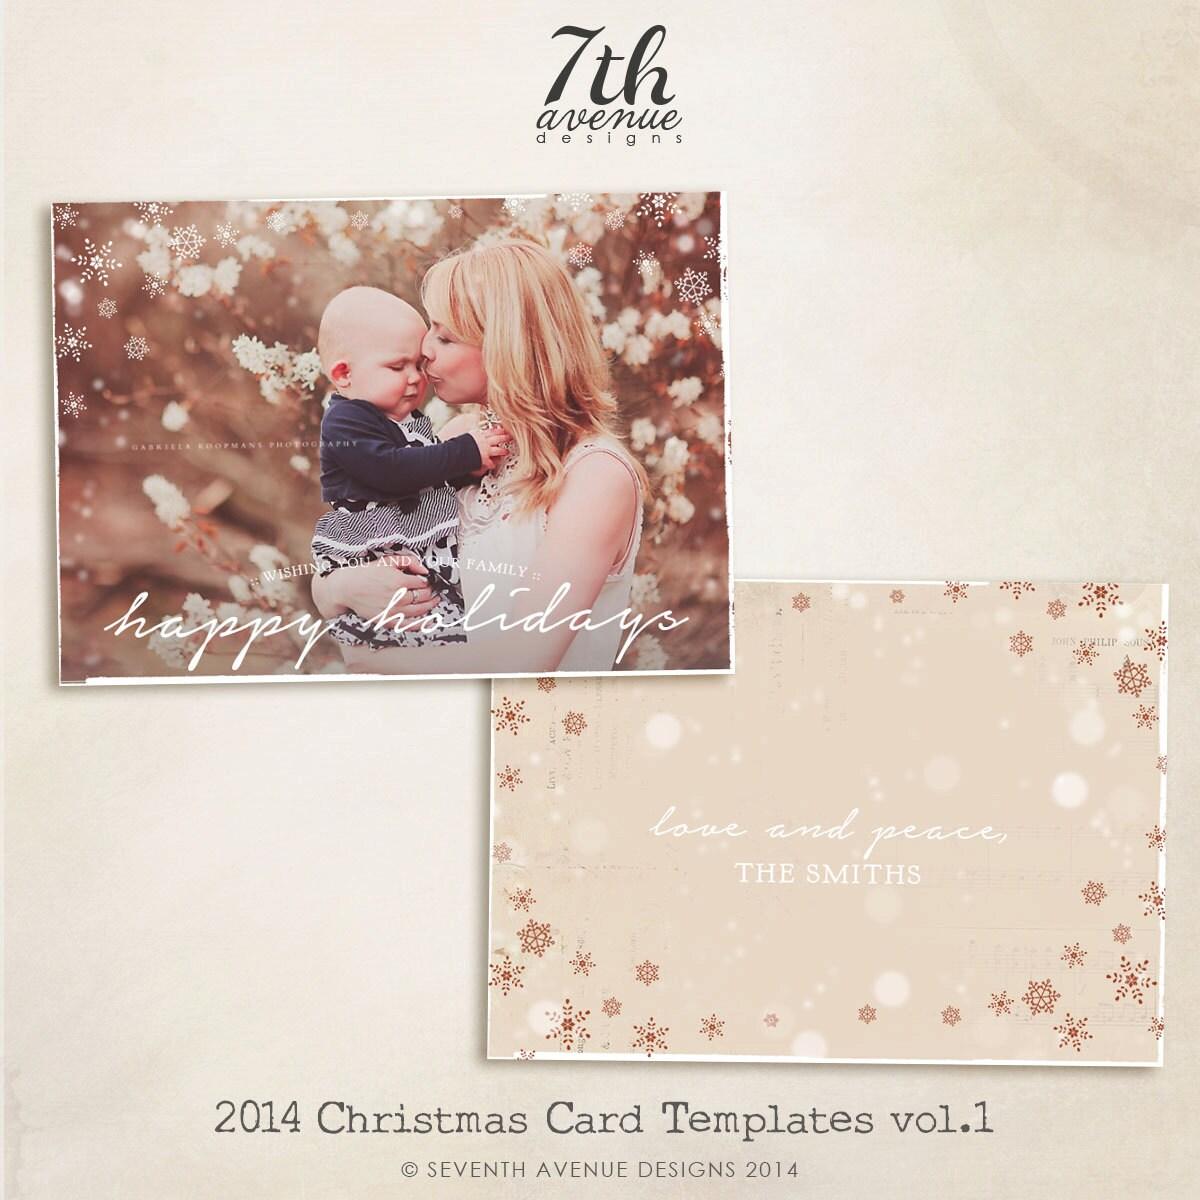 2014 Christmas Card Templates Vol.1 7x5 Inch Card Template